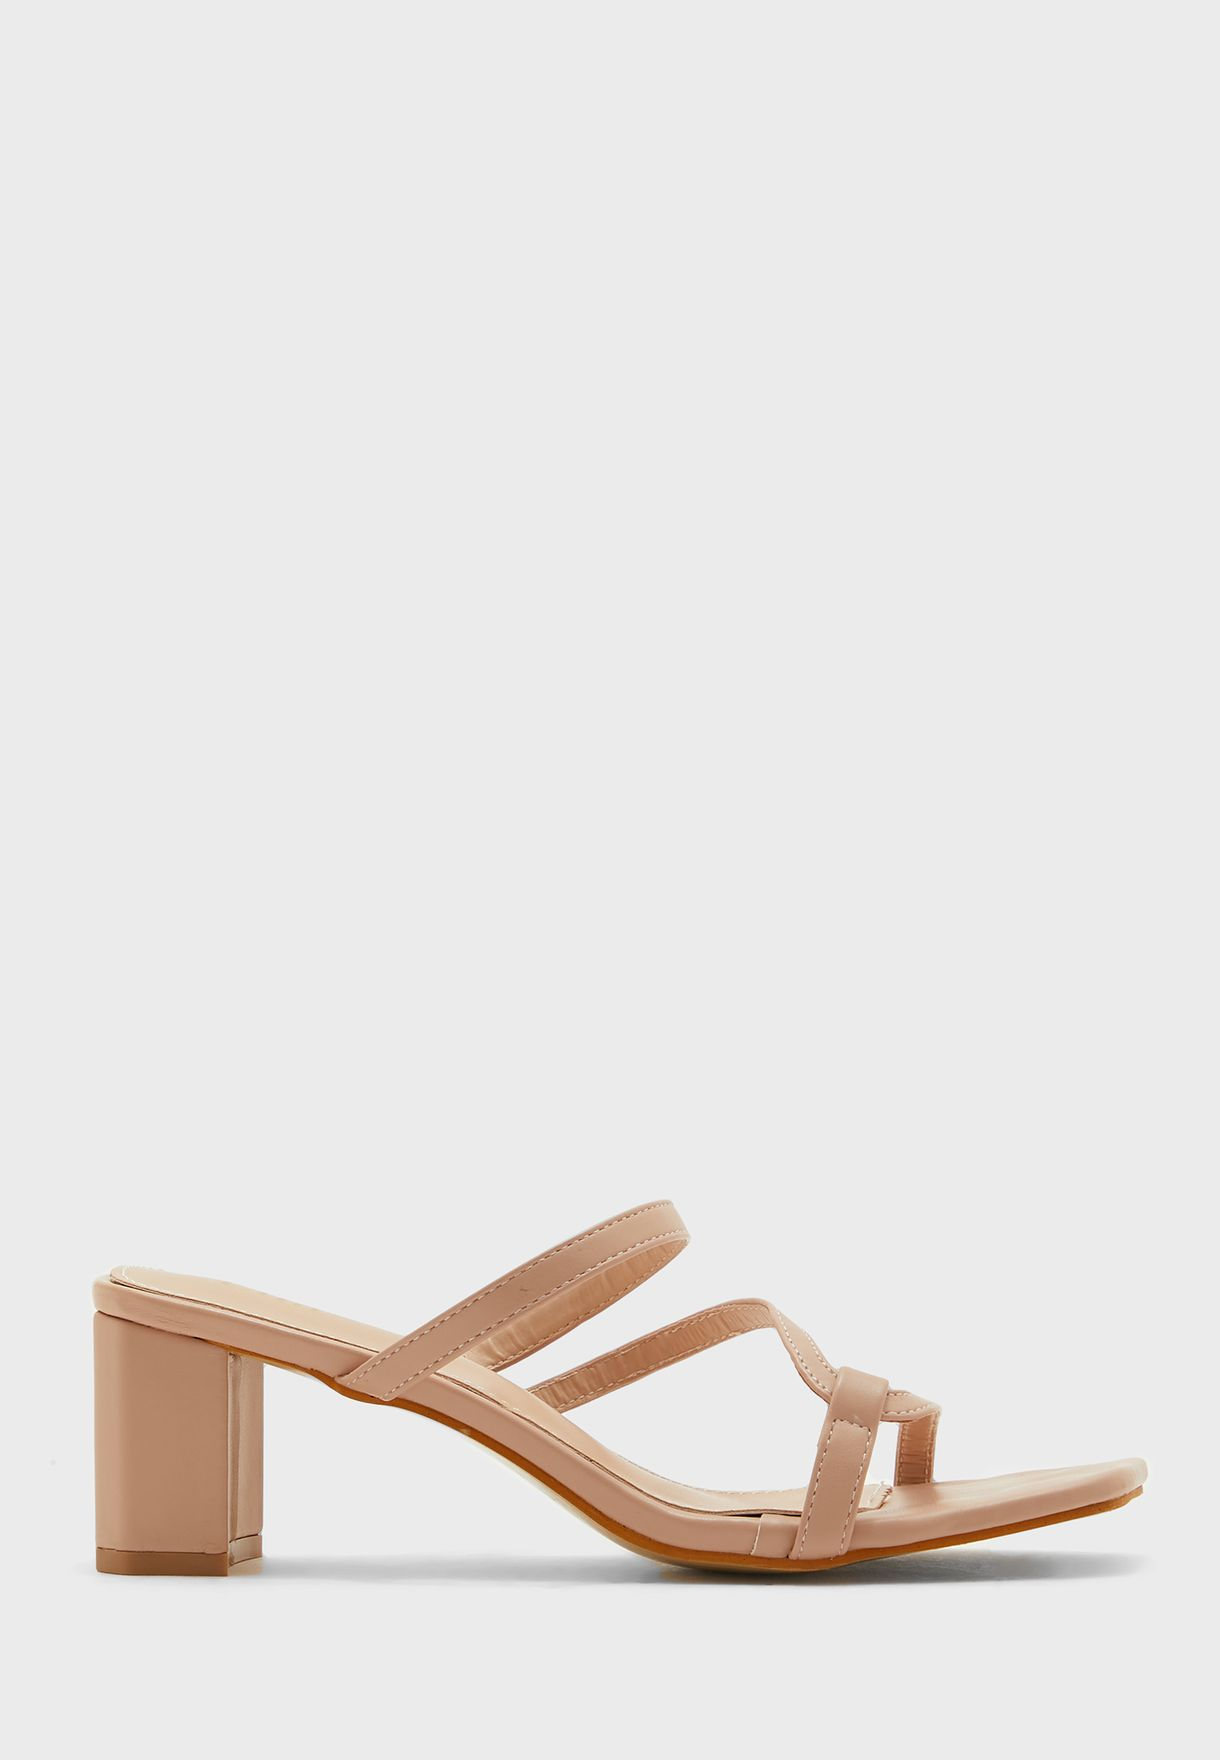 Square Toe Skinny Strap Mules